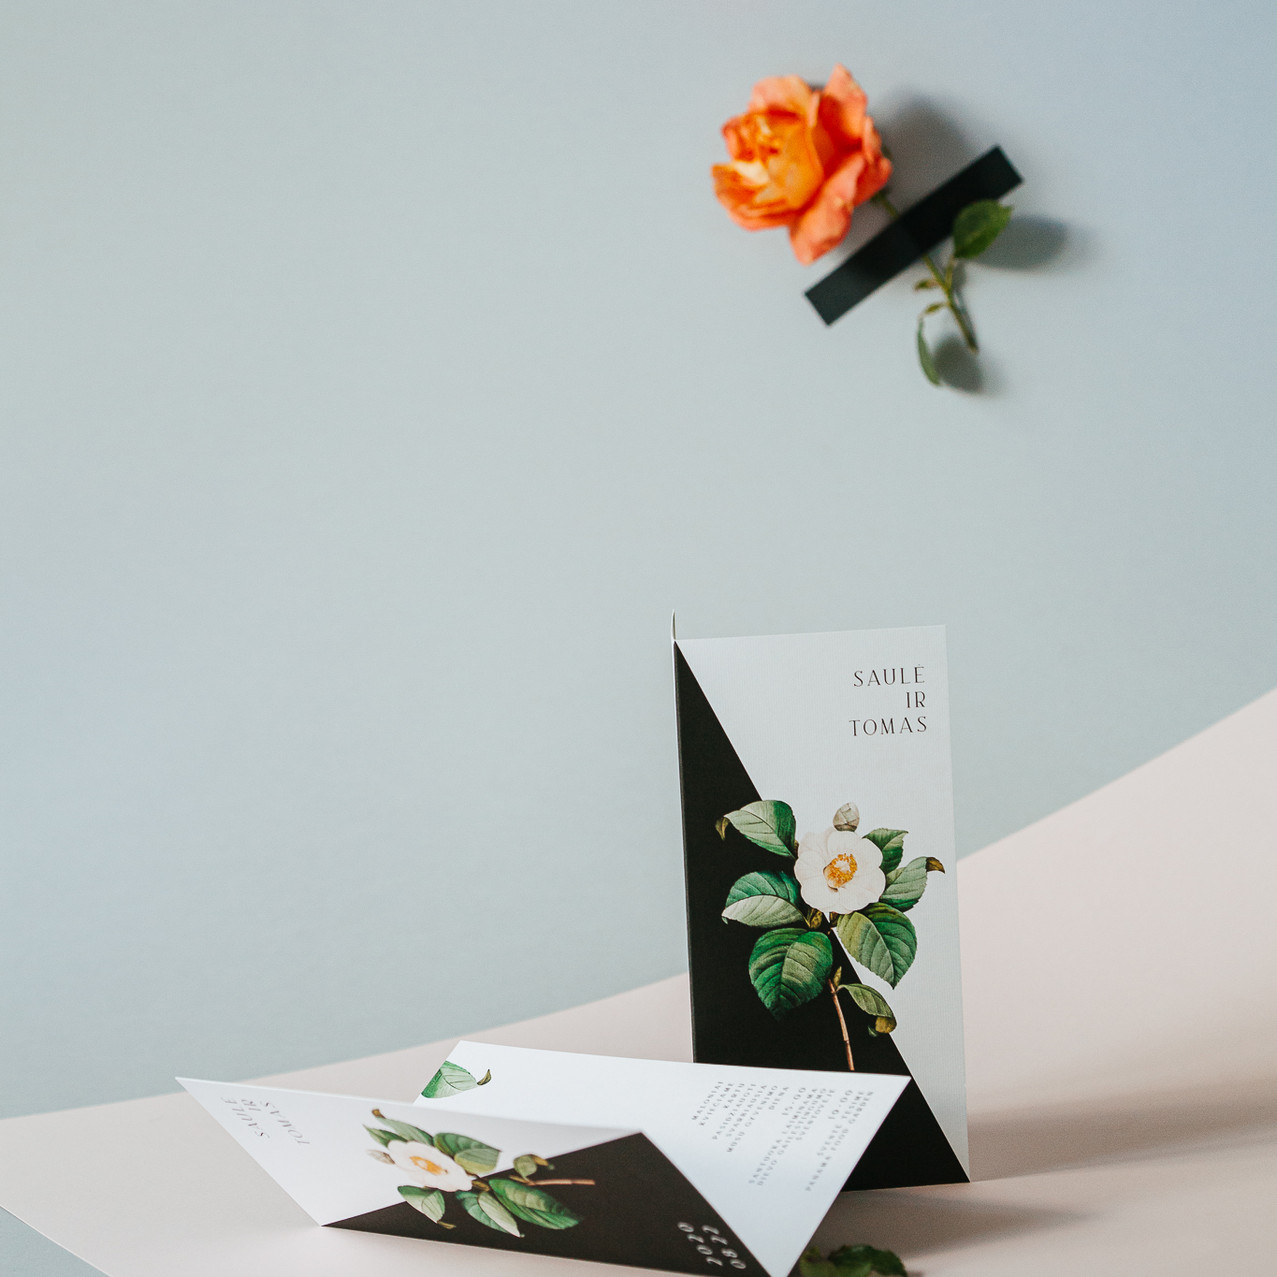 vestuviniai kvietimai moderni roze brukn